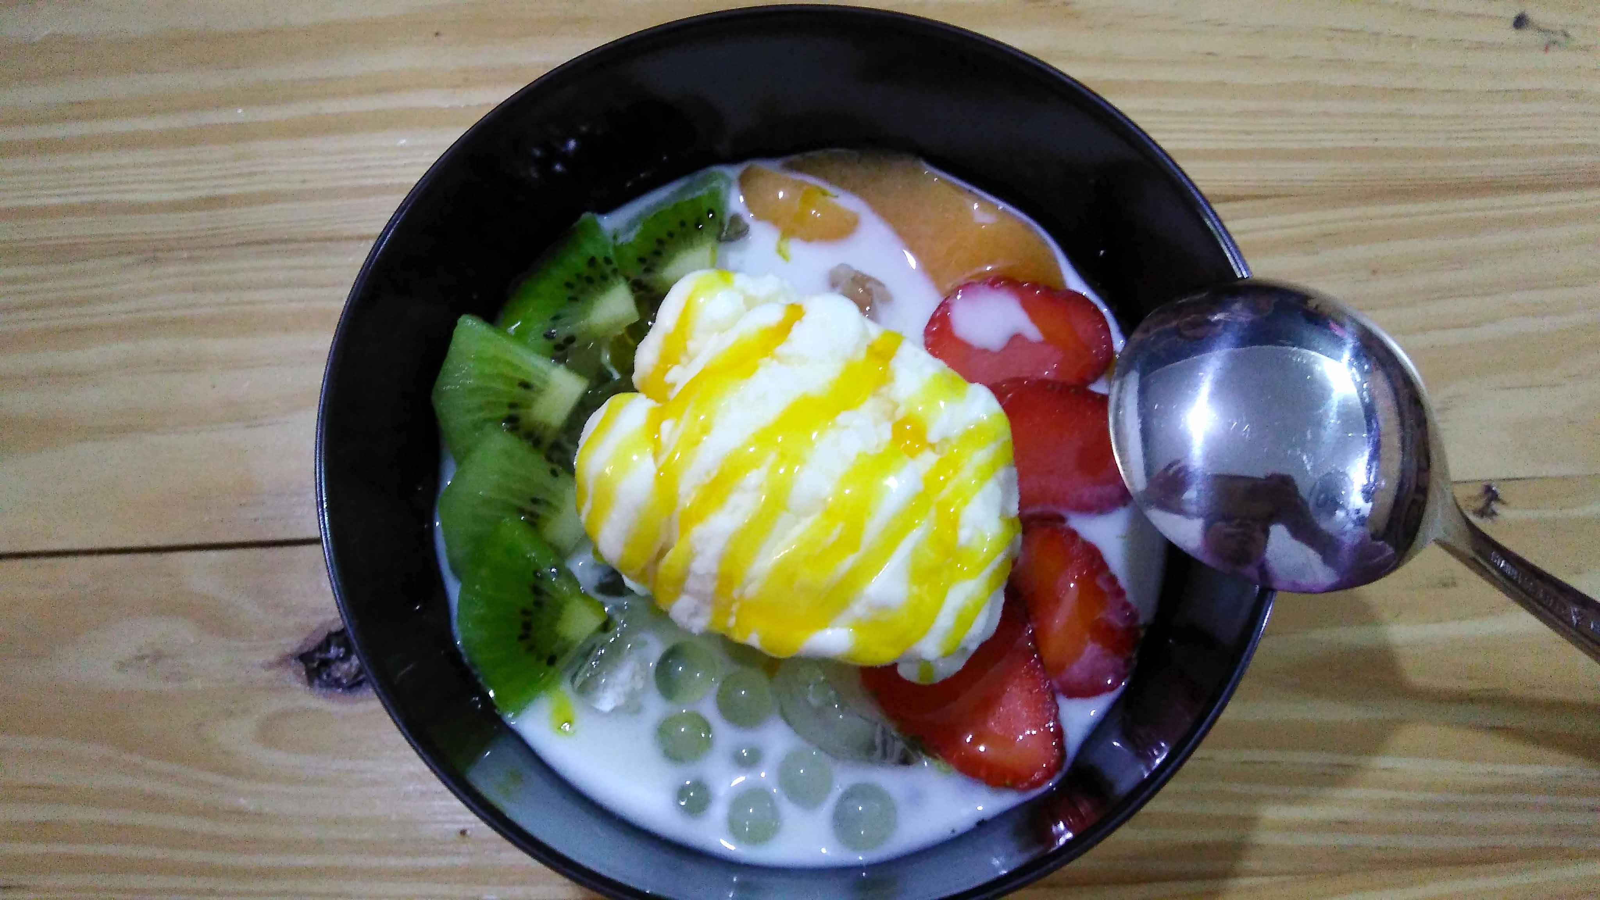 Dessert Tropicana Tuti Fruty dengan topping pudding mangga, popping boba, jelly plain, kiwi, stroberi, es krim dan mango sauce.